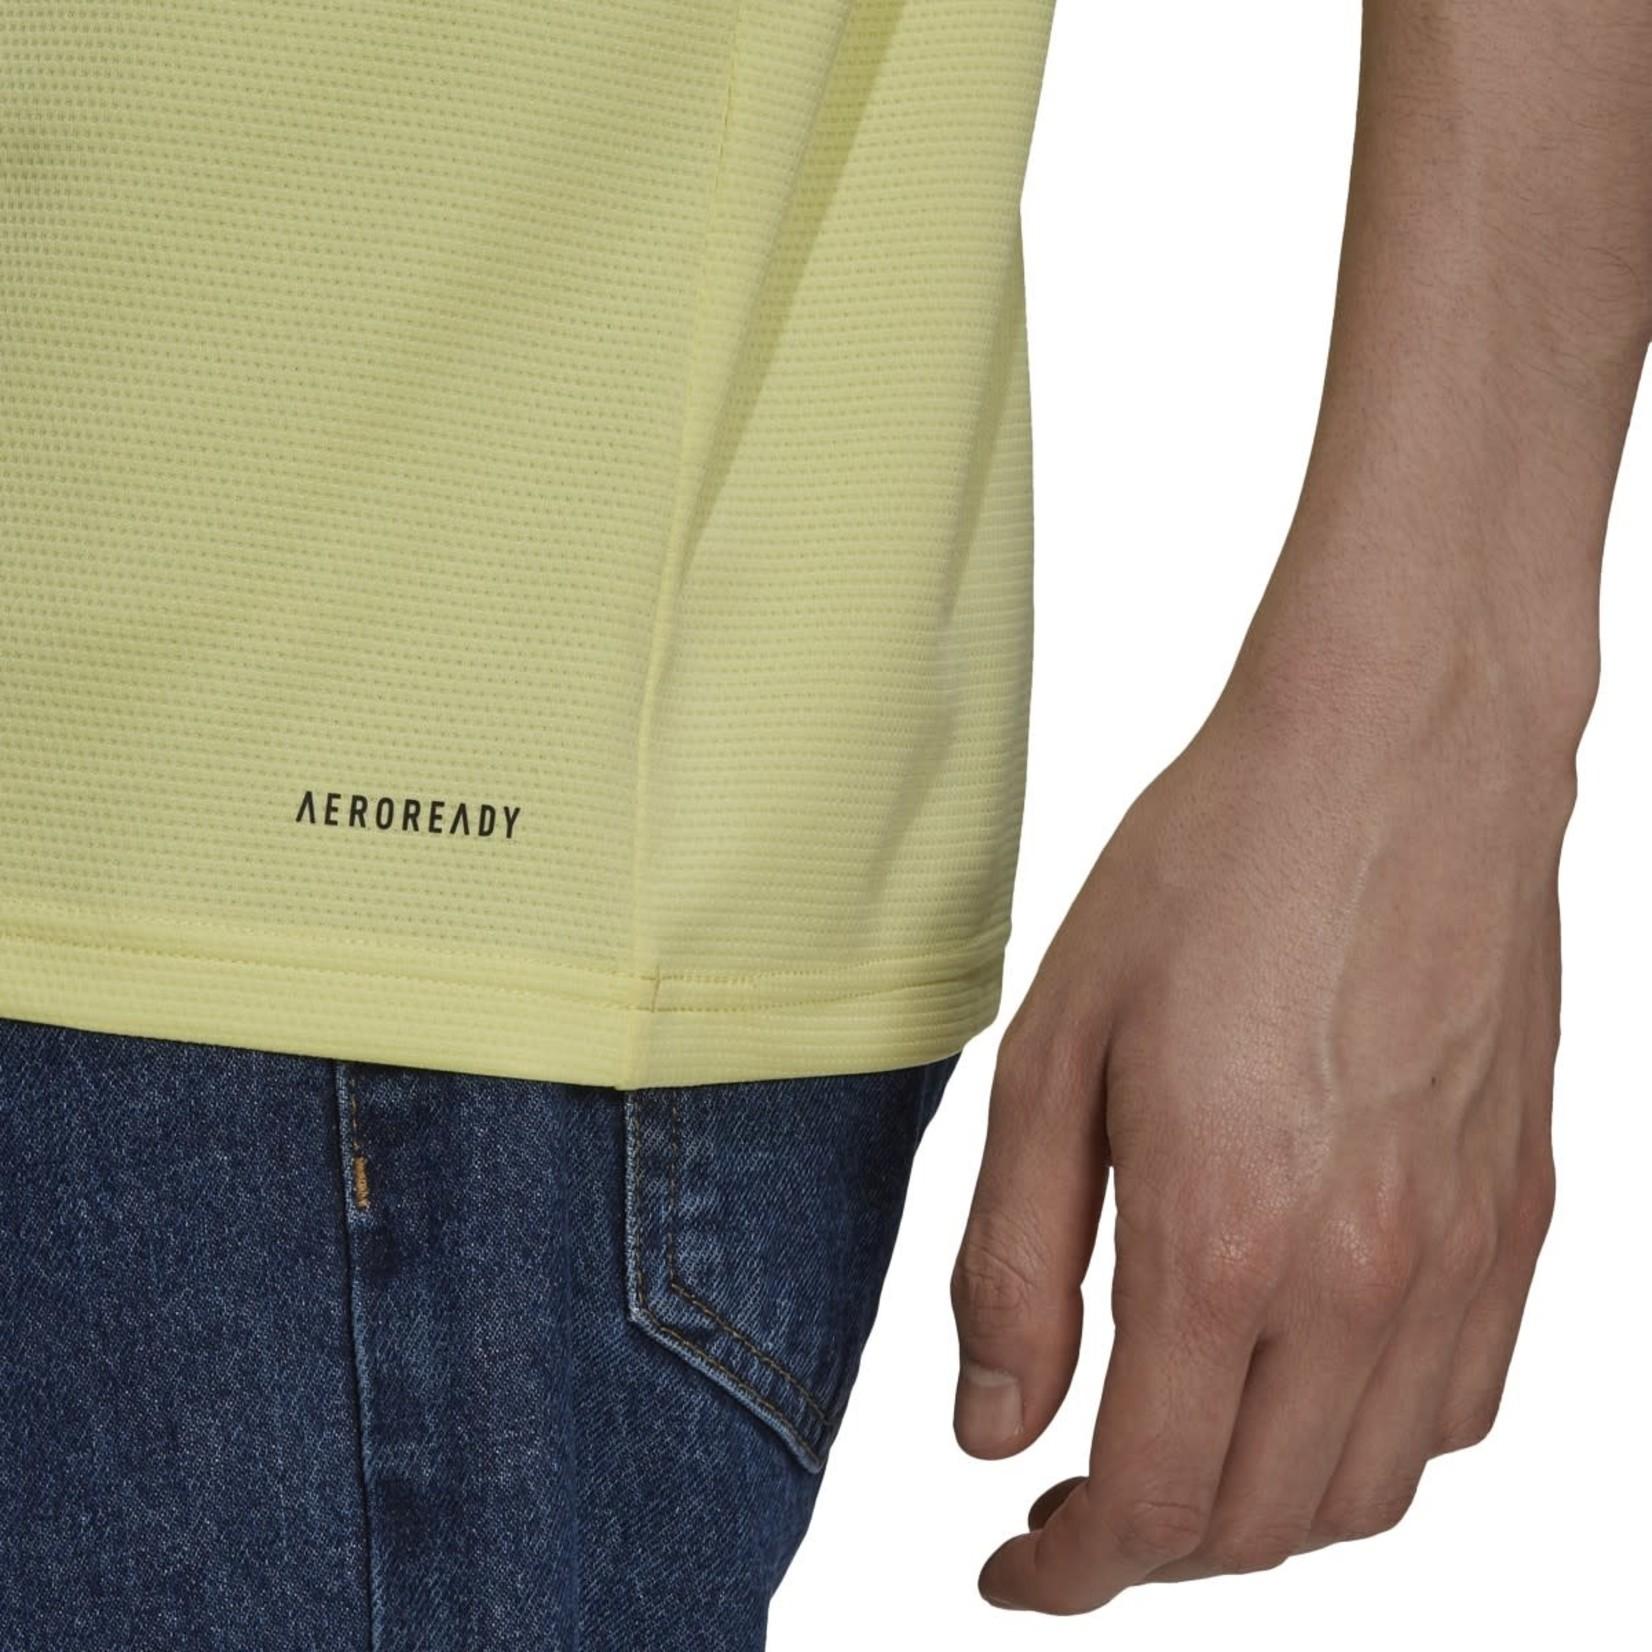 ADIDAS ARSENAL 21/22 AWAY JERSEY (YELLOW)